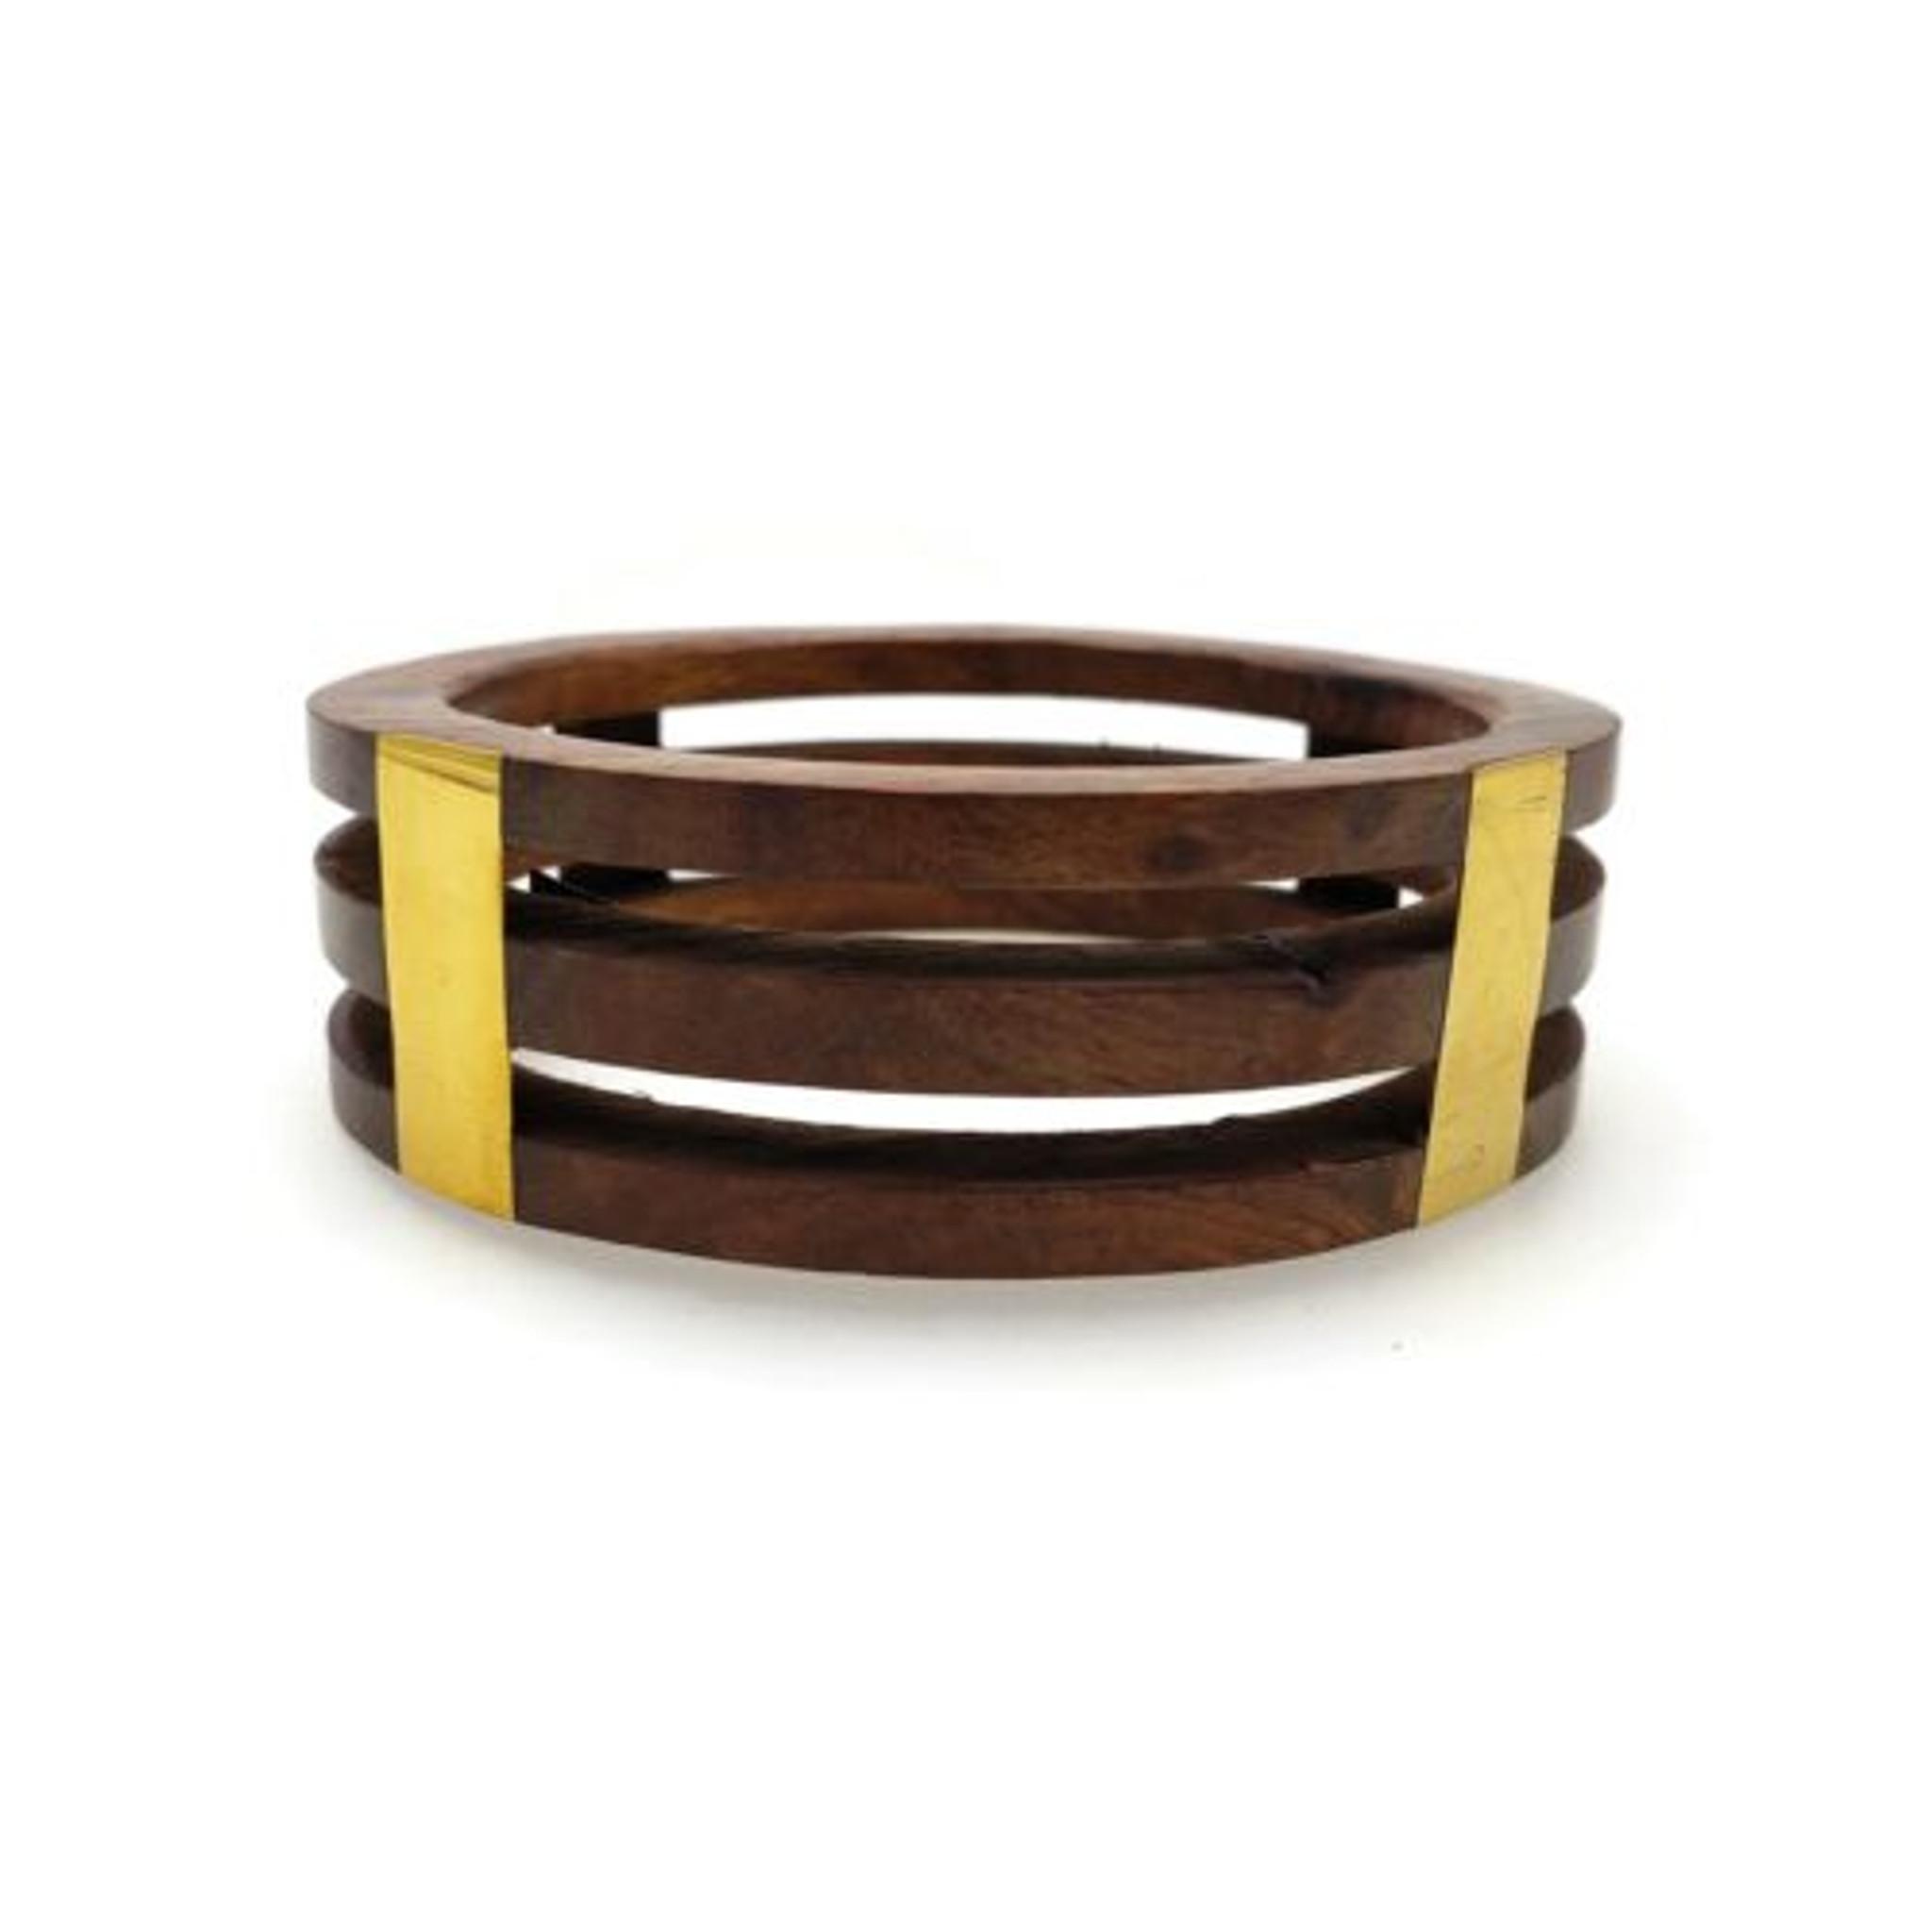 Serena Layered Wood and Brass Inlay Bangle